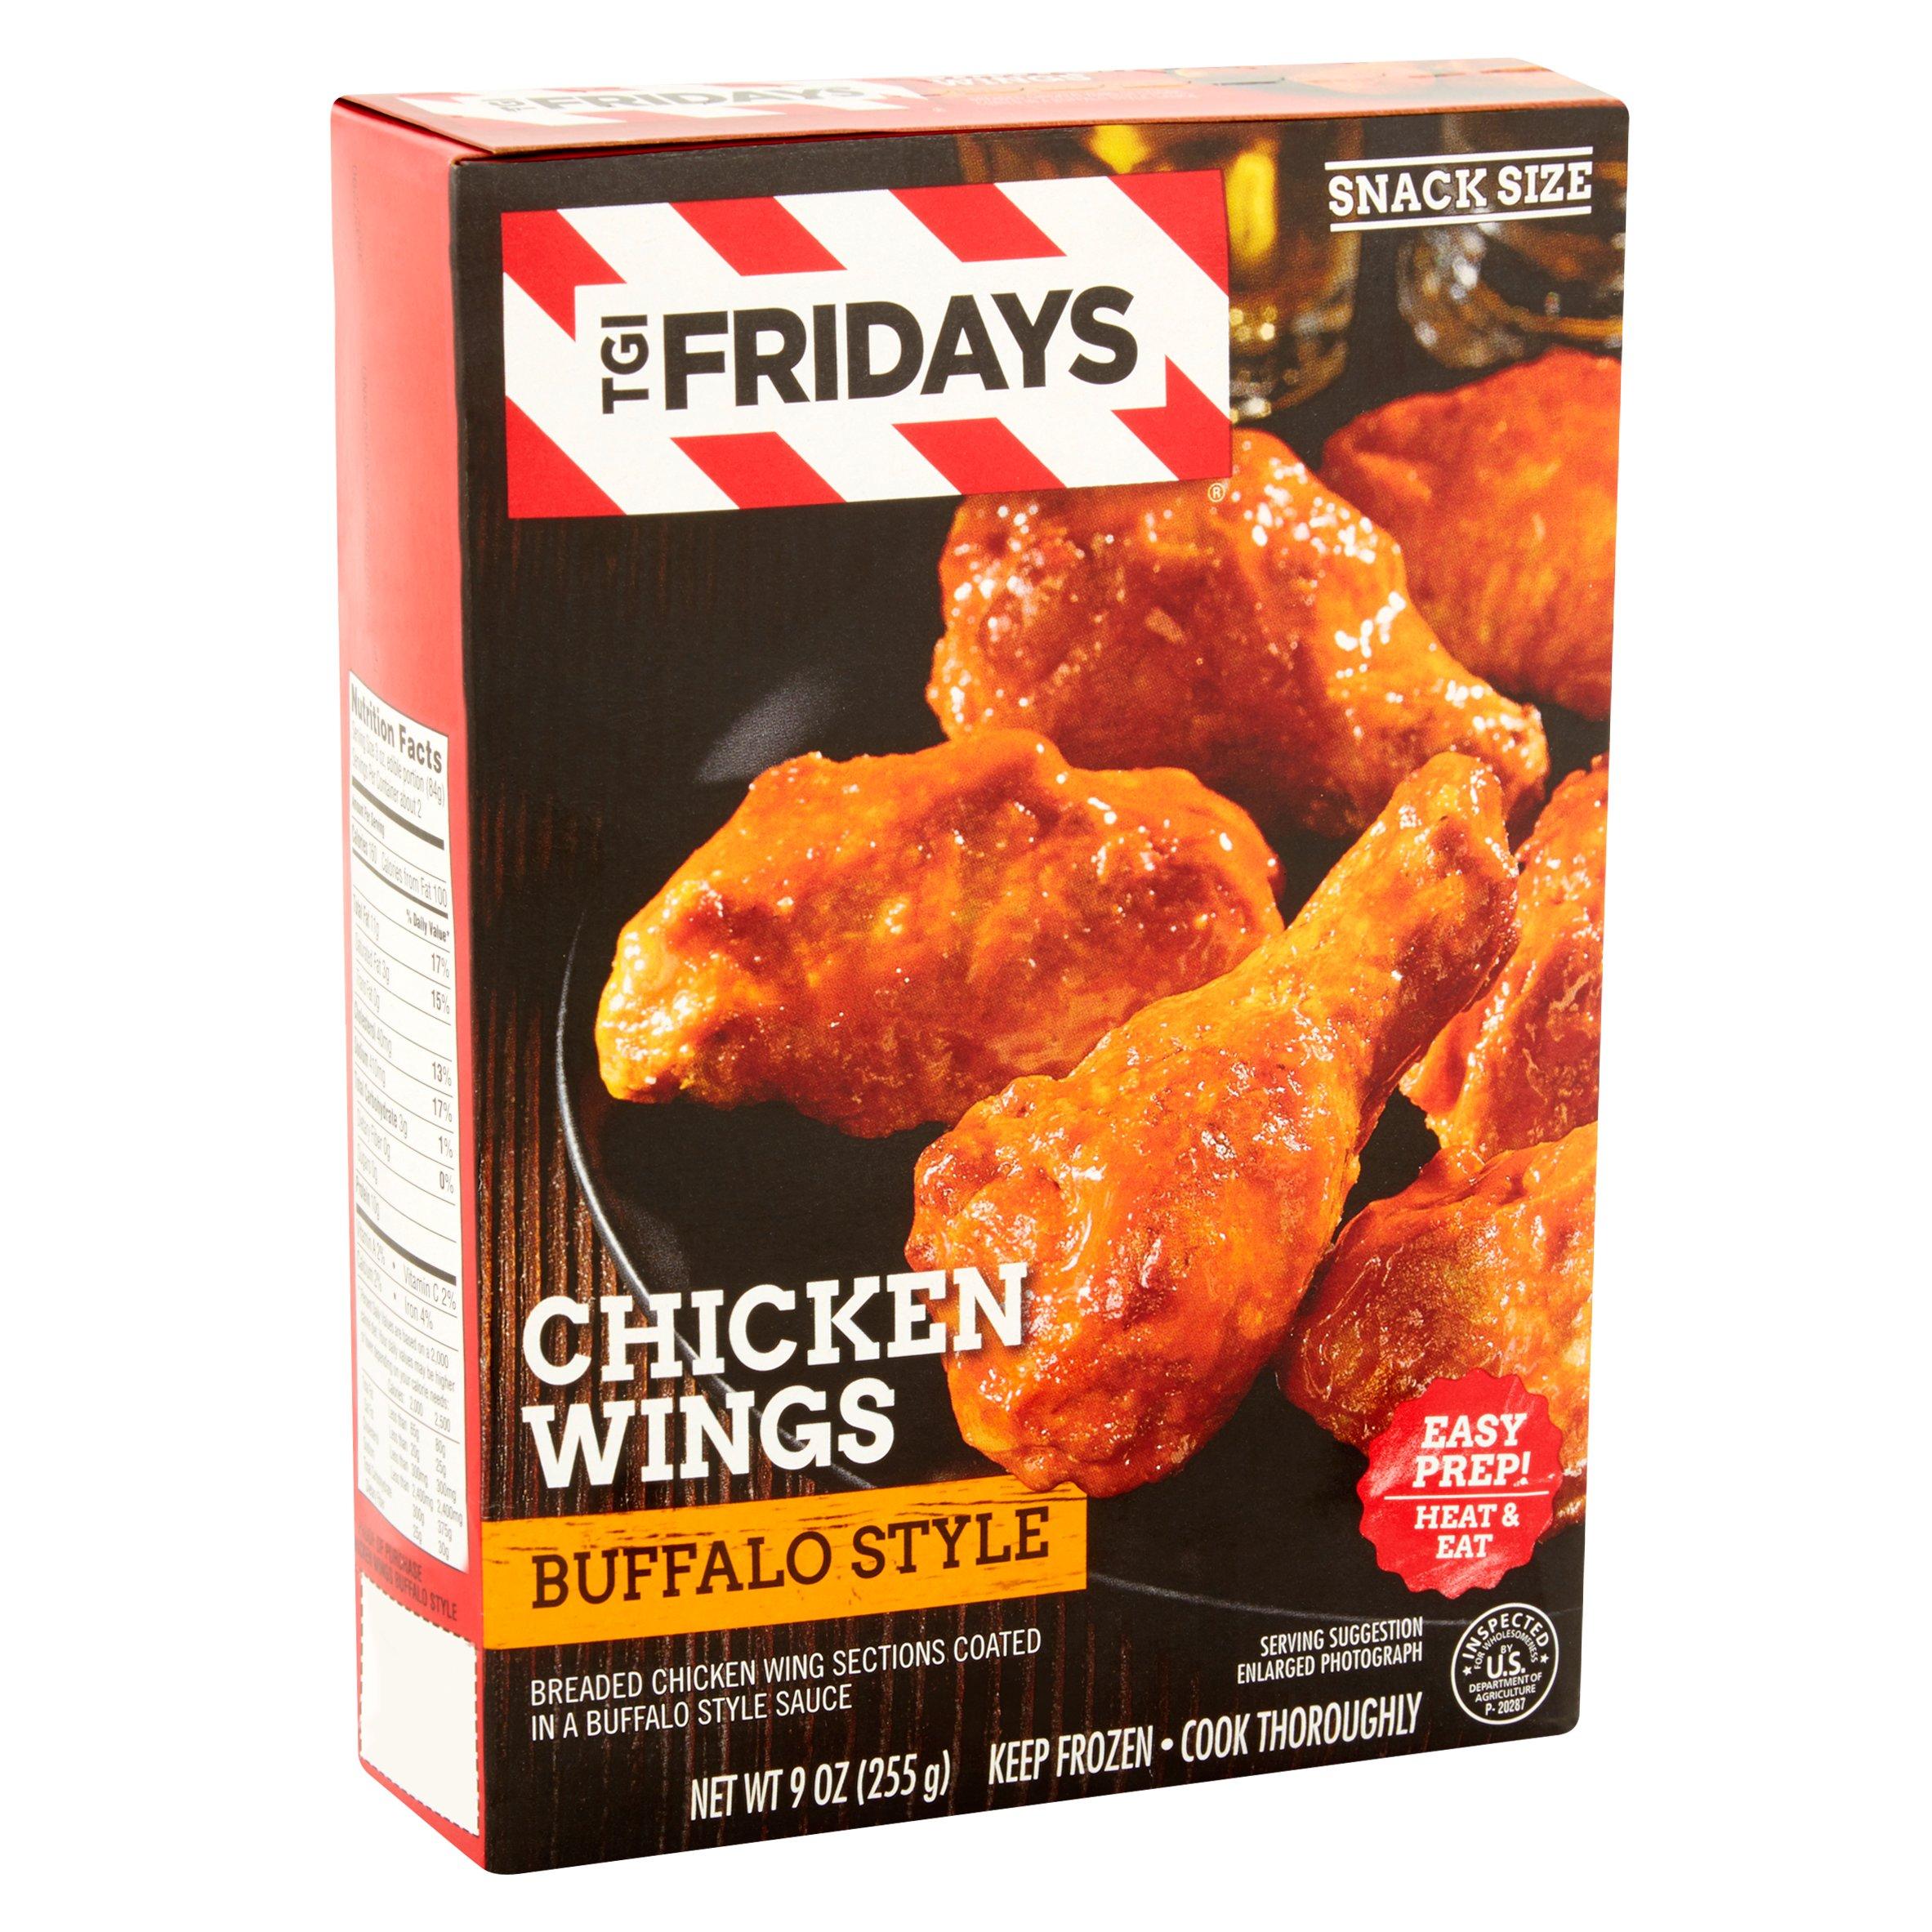 Tgi Fridays Ghost Pepper Wings Recipe  Besto Blog